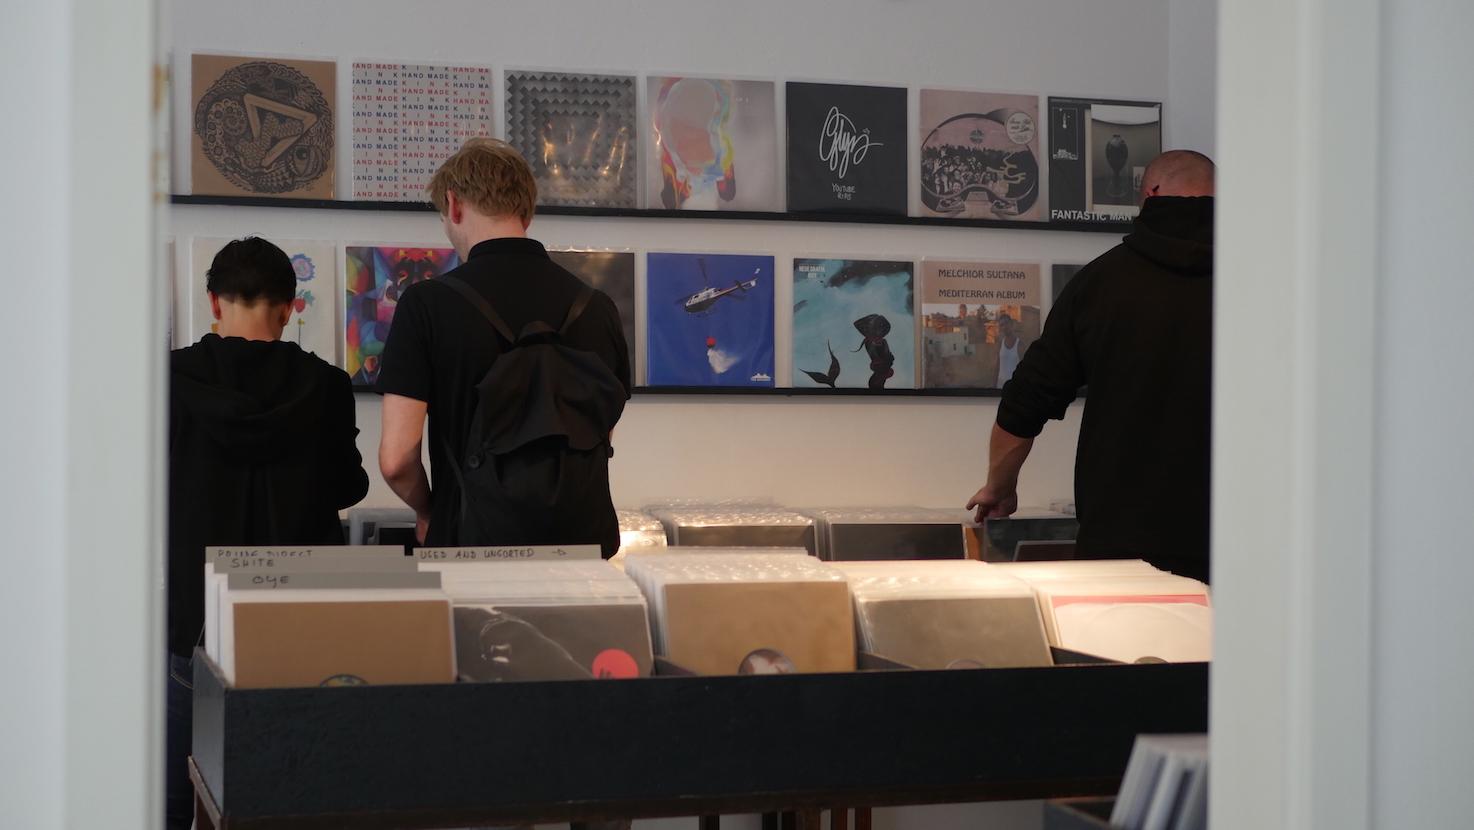 Fundus Record Store, Bilker Allee in Düsseldorf